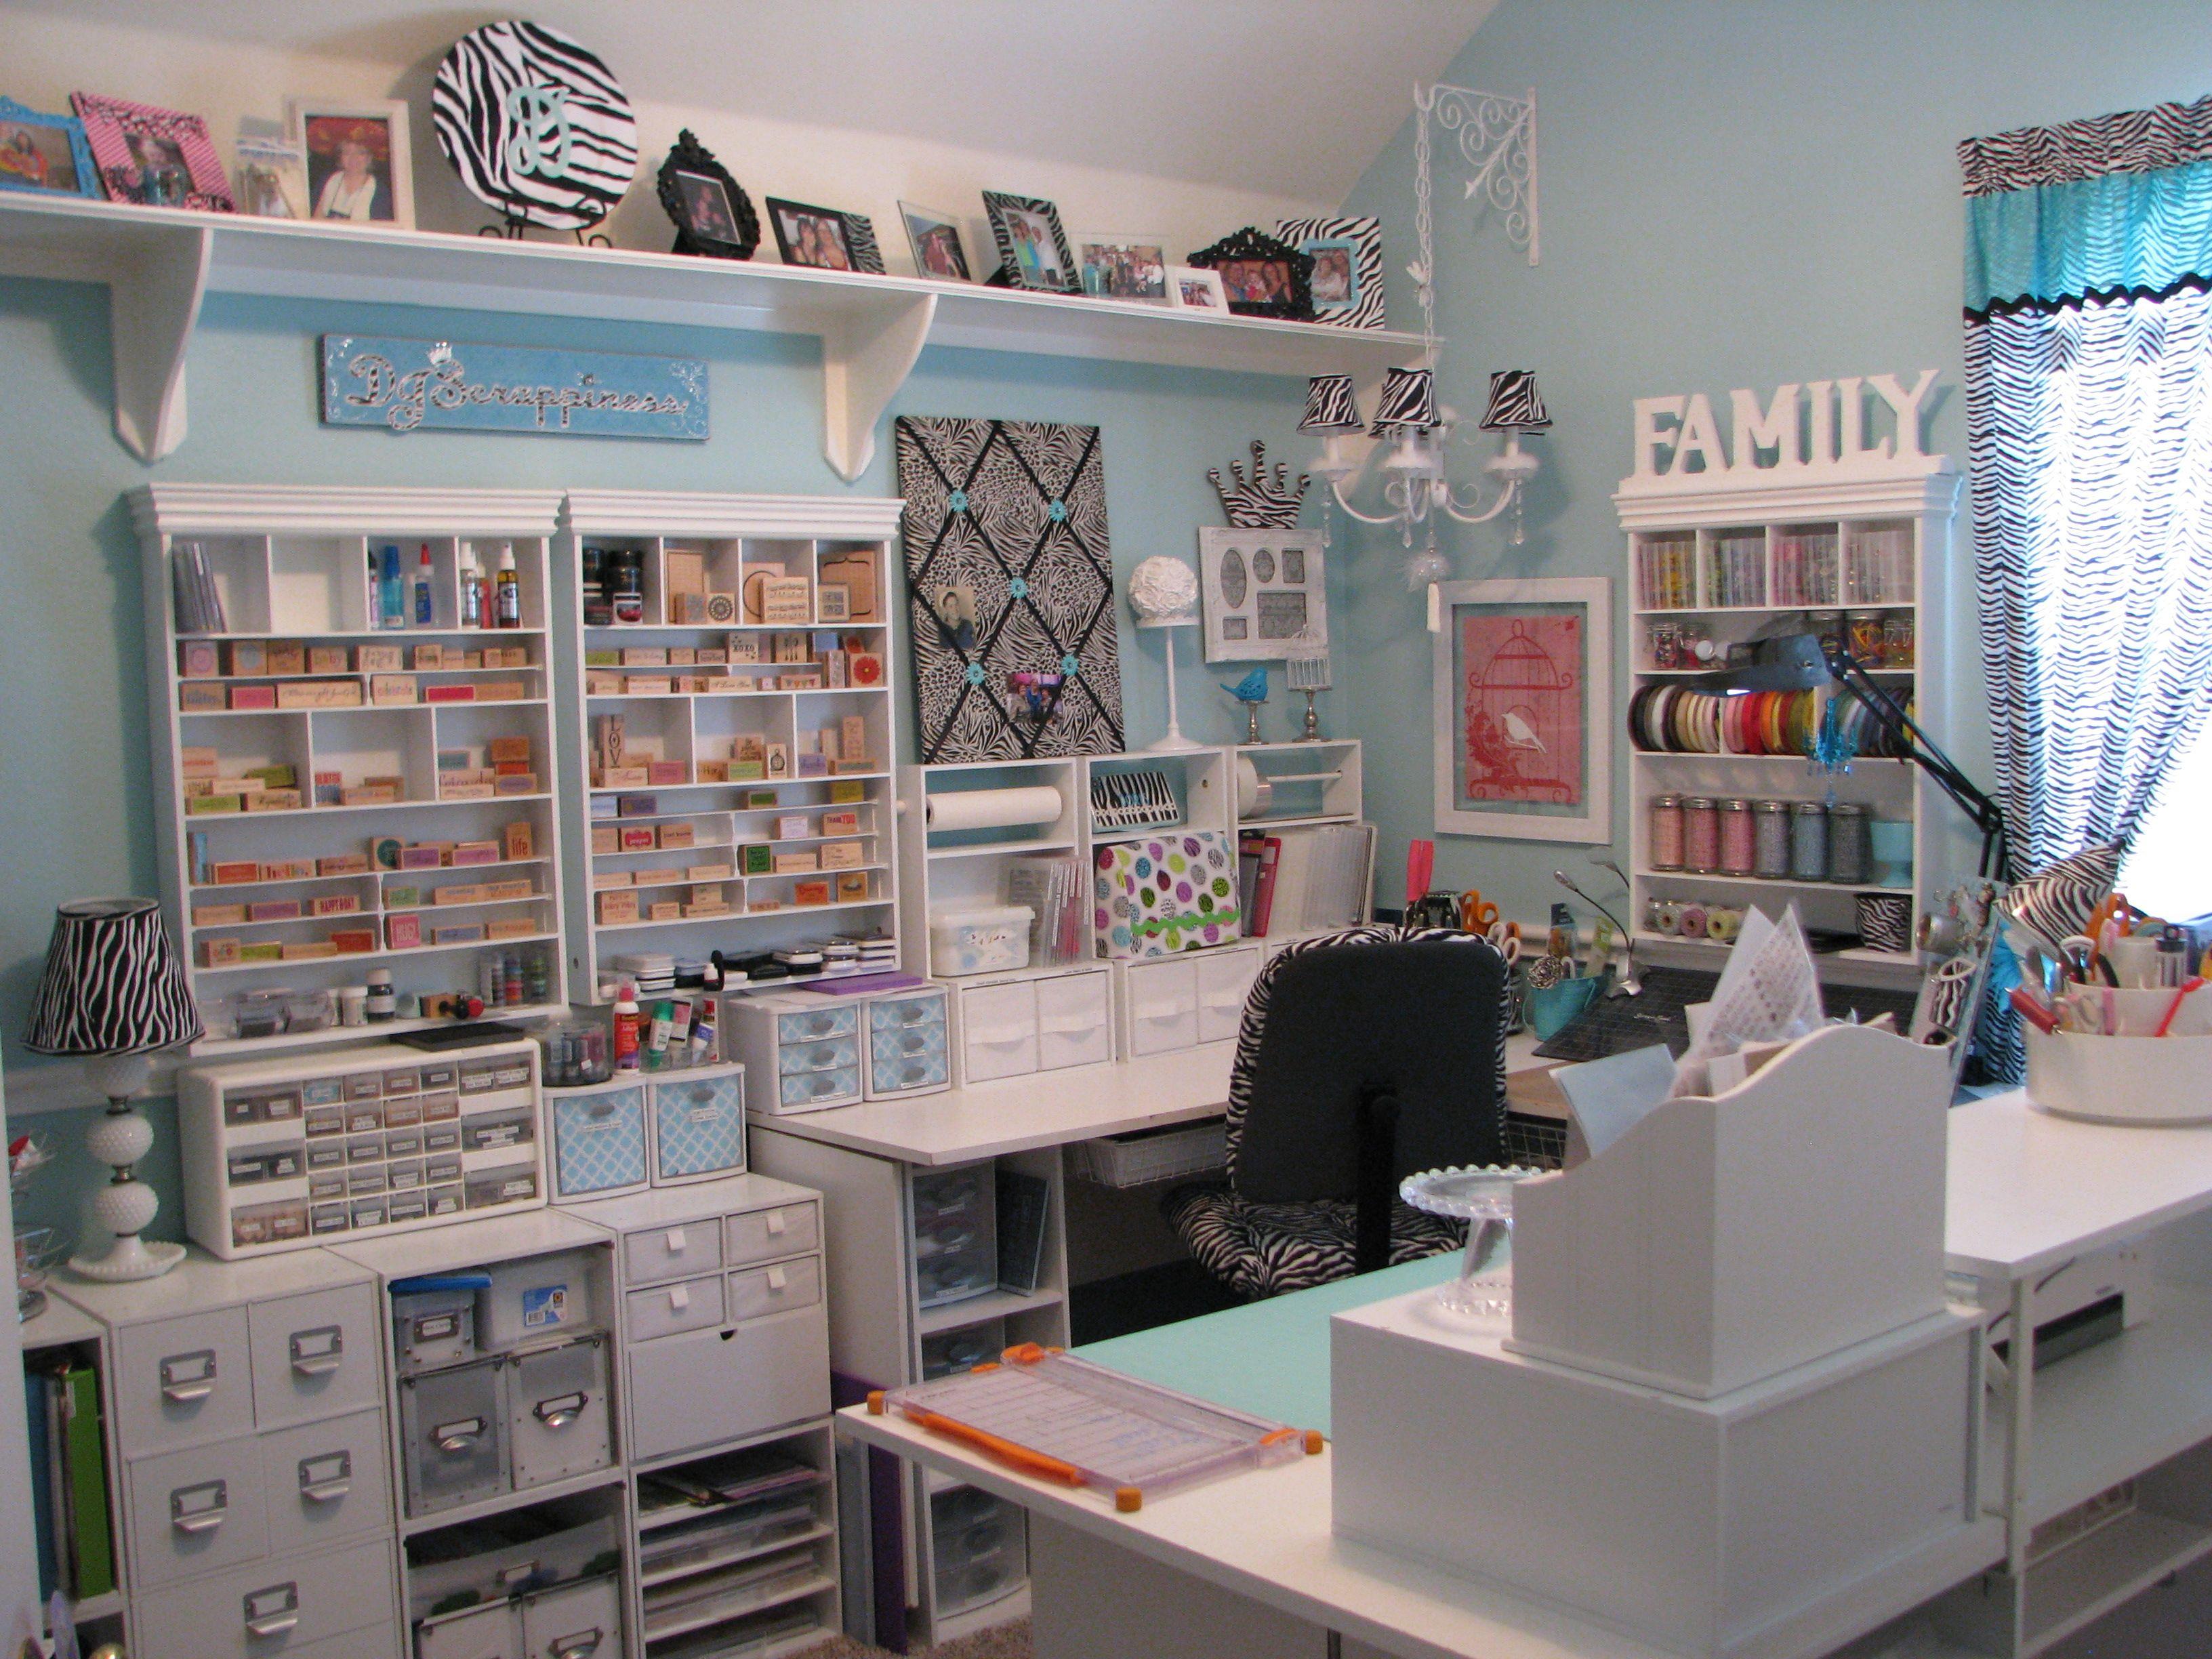 Scrapbook room ideas - Craft Room Storage And Organization Ideas Img_2695